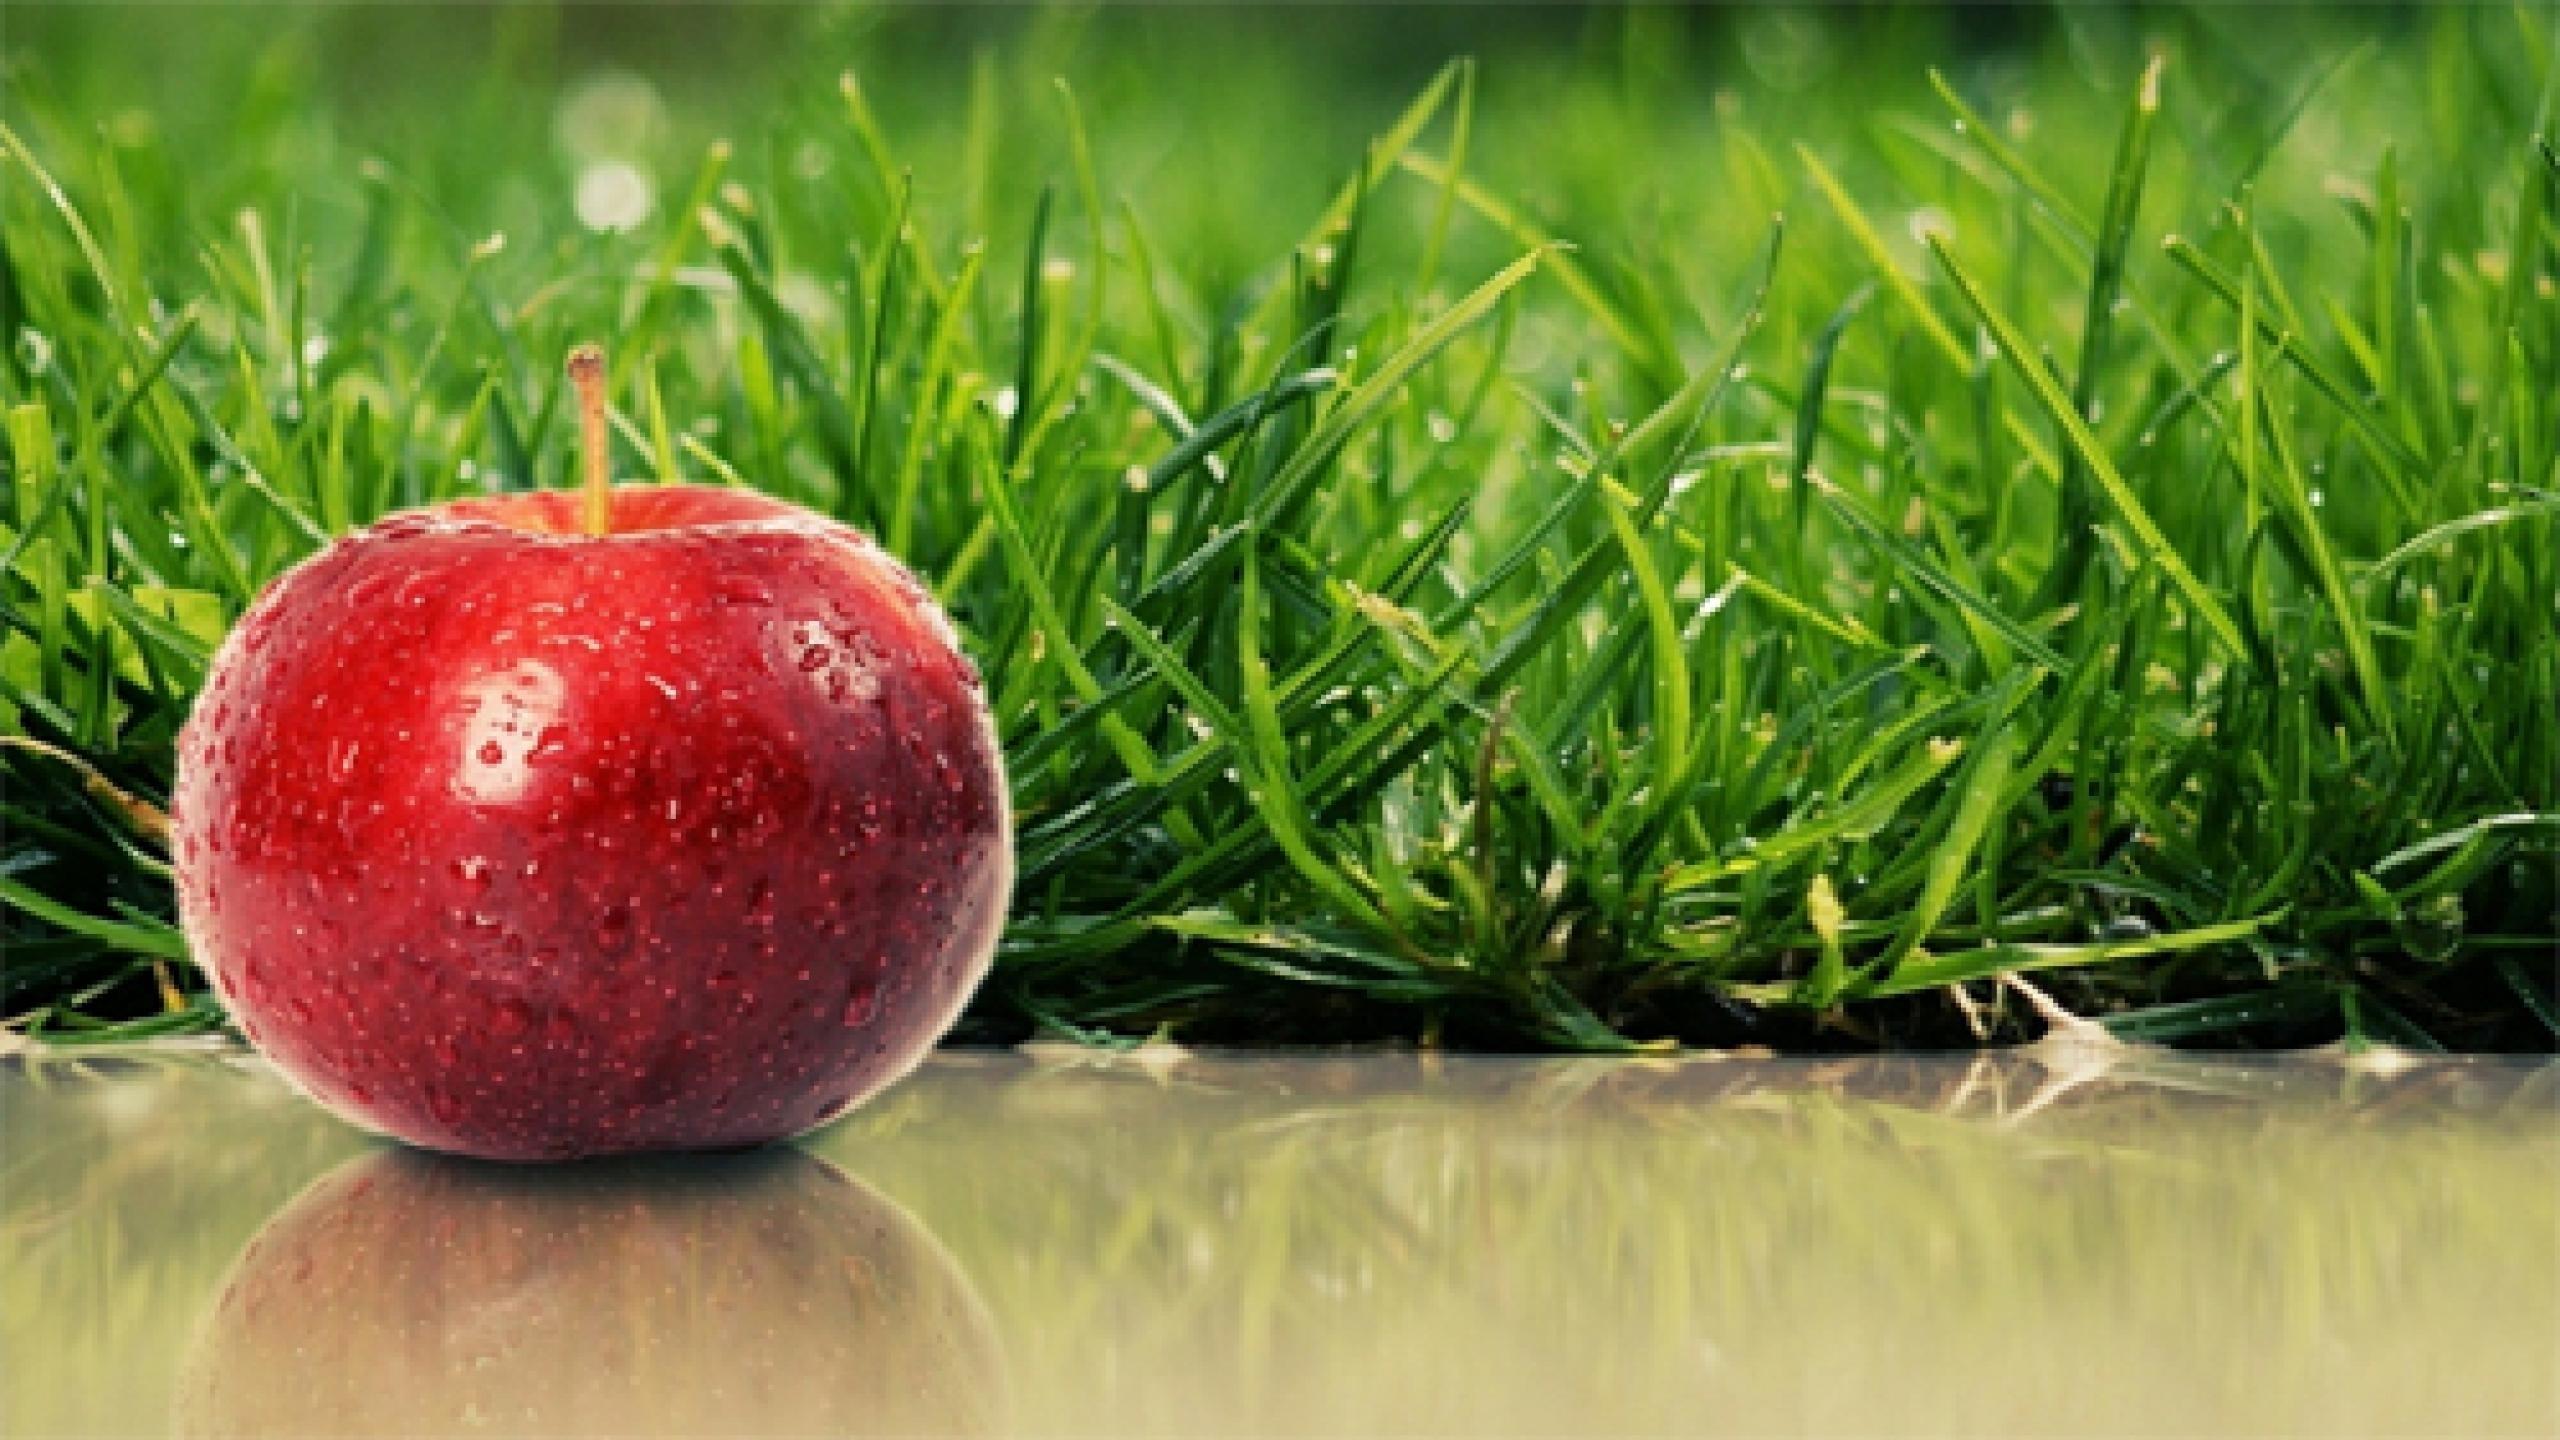 Res: 2560x1440, apple fruit wallpaper free download ...